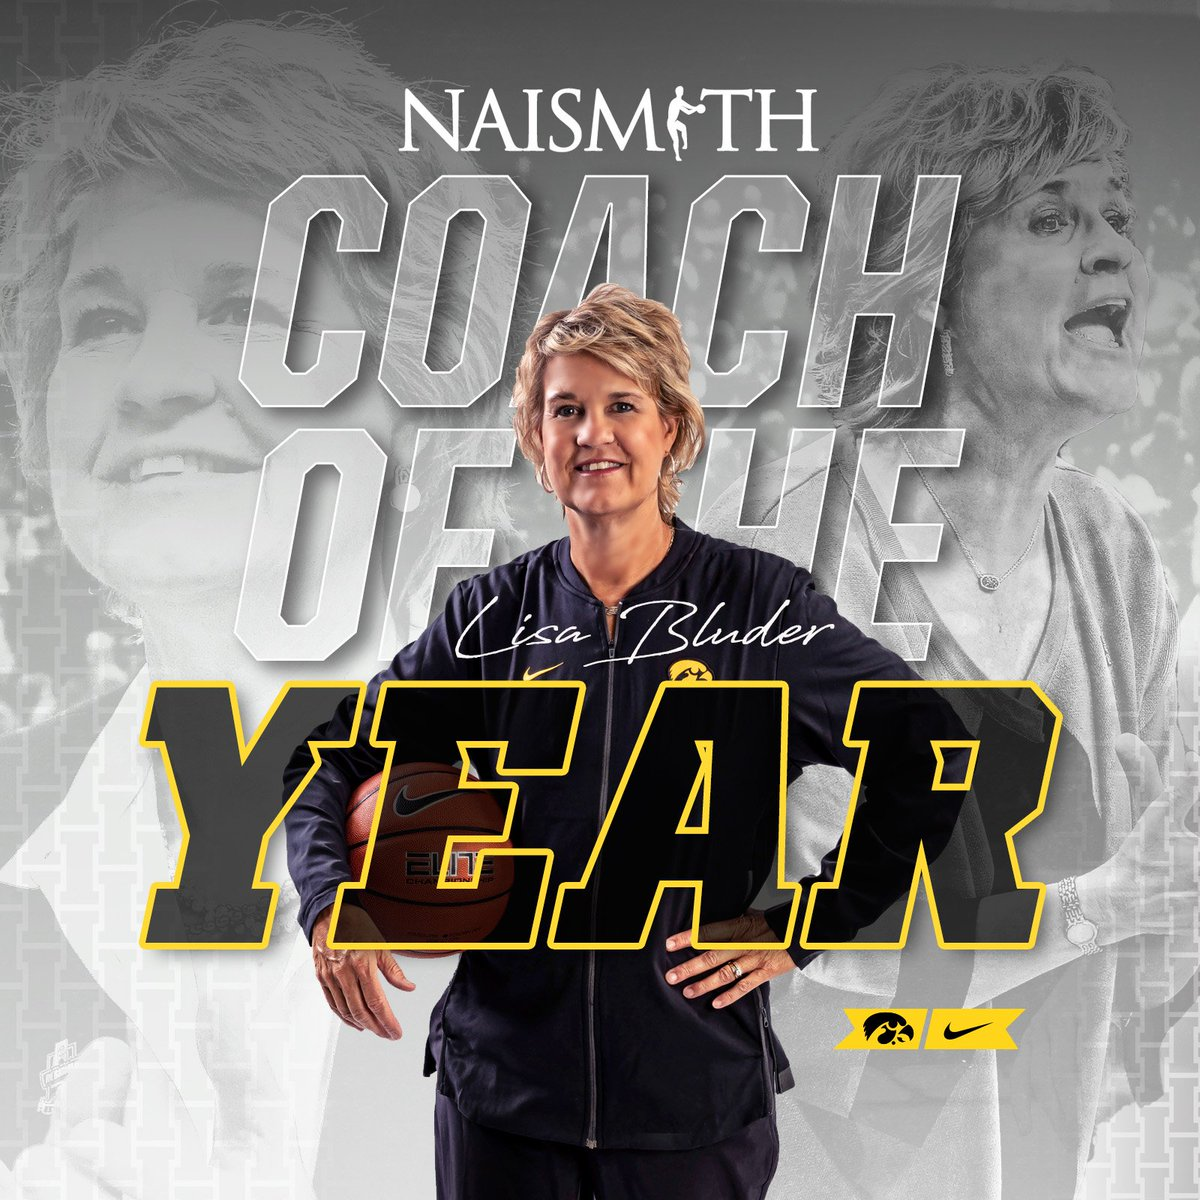 IT'S A HAWKEYE SWEEP!   @LisaBluder is the Werner Ladder Naismith Coach of the Year! #Hawkeyes #FightForIowa